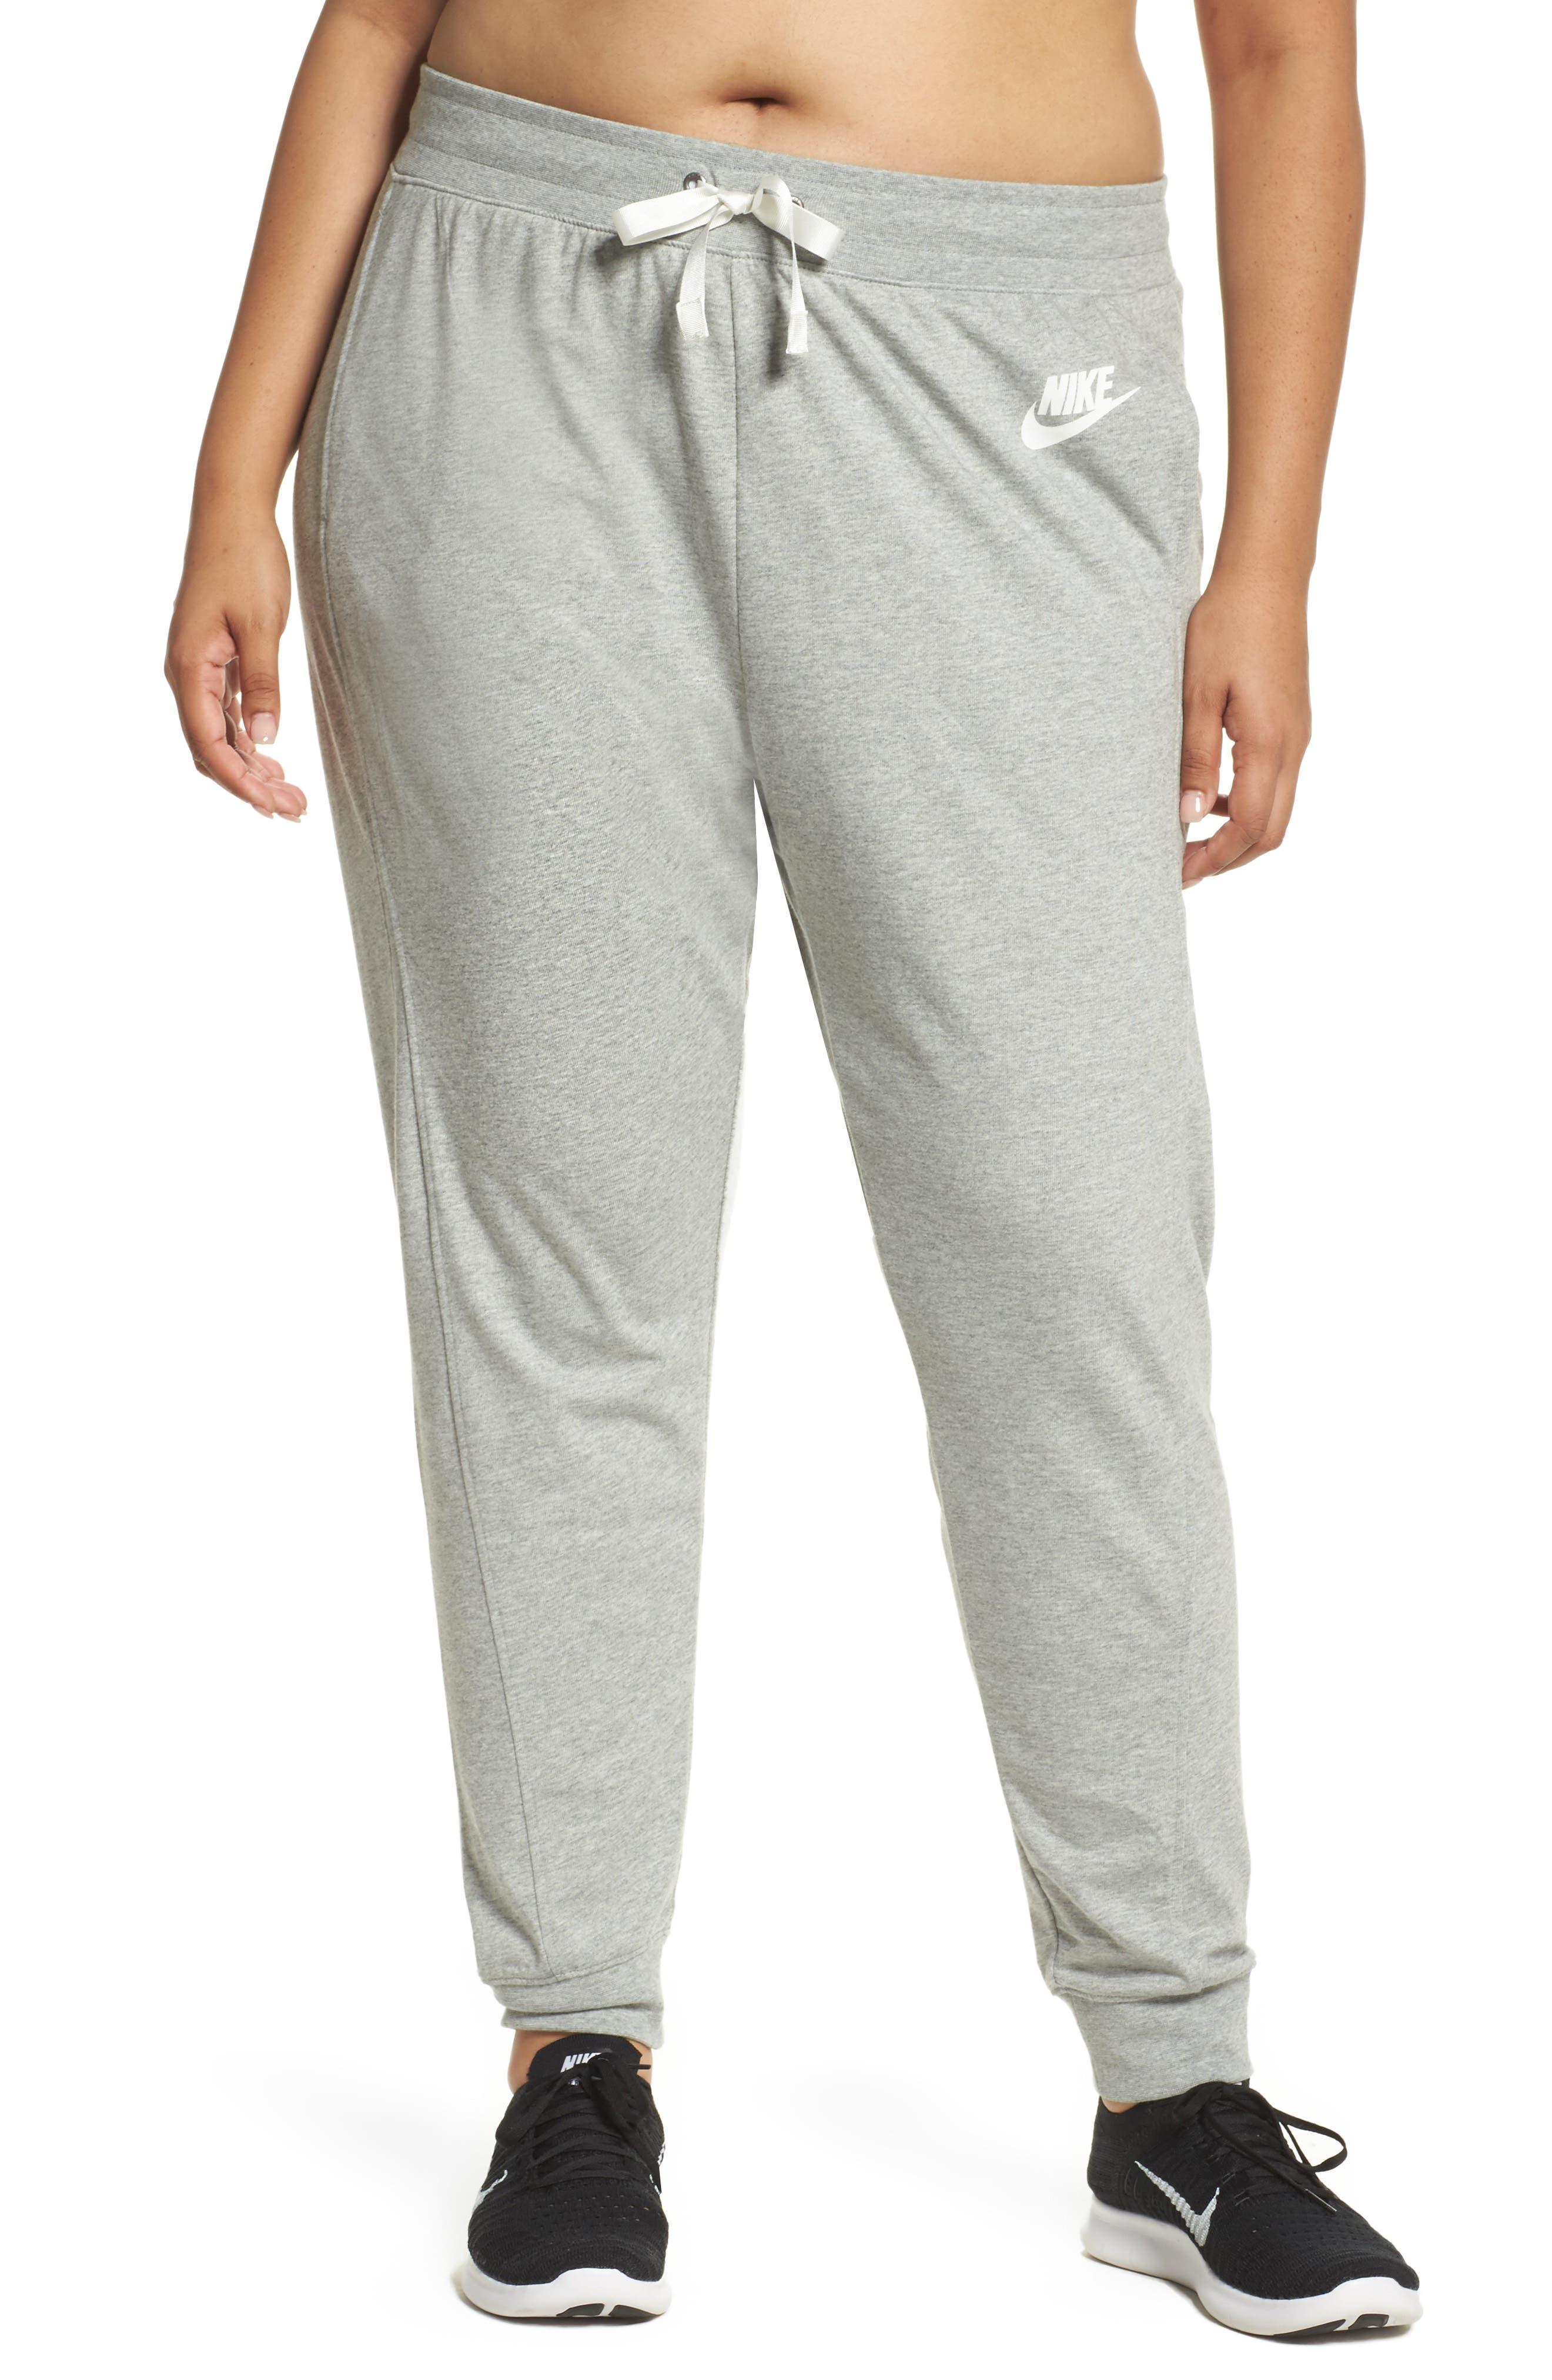 NIKE Sportswear Gym Classic Pants